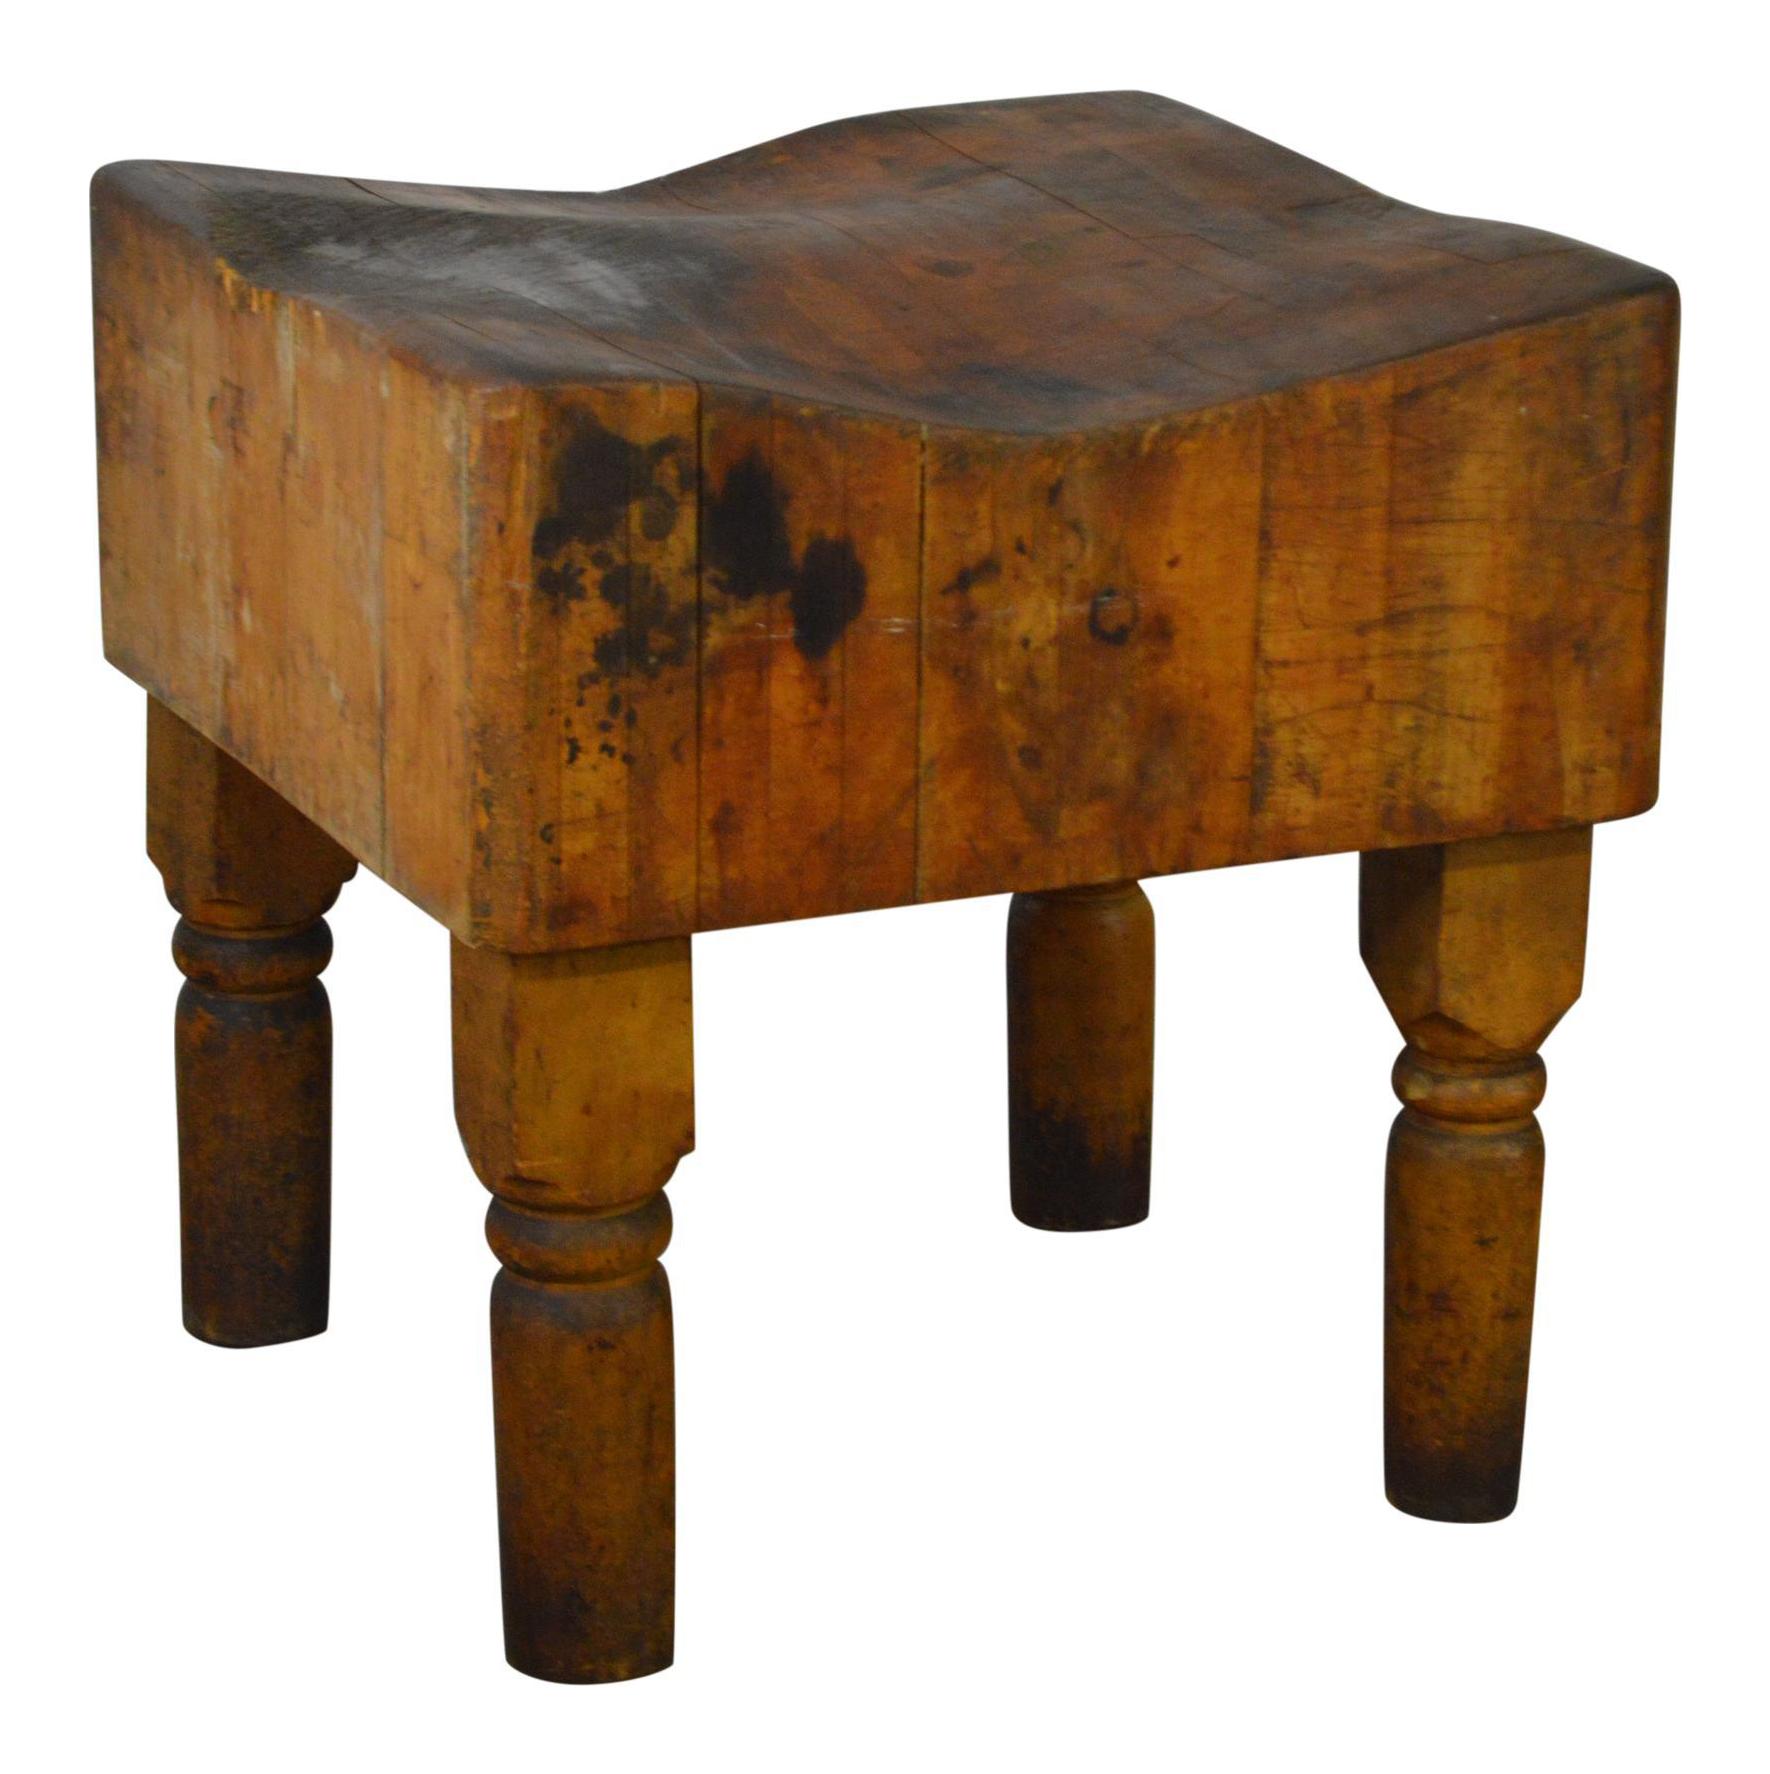 antique vintage butcher block table vintage  u0026 used kitchen islands  u0026 butcherblocks   chairish  rh   chairish com